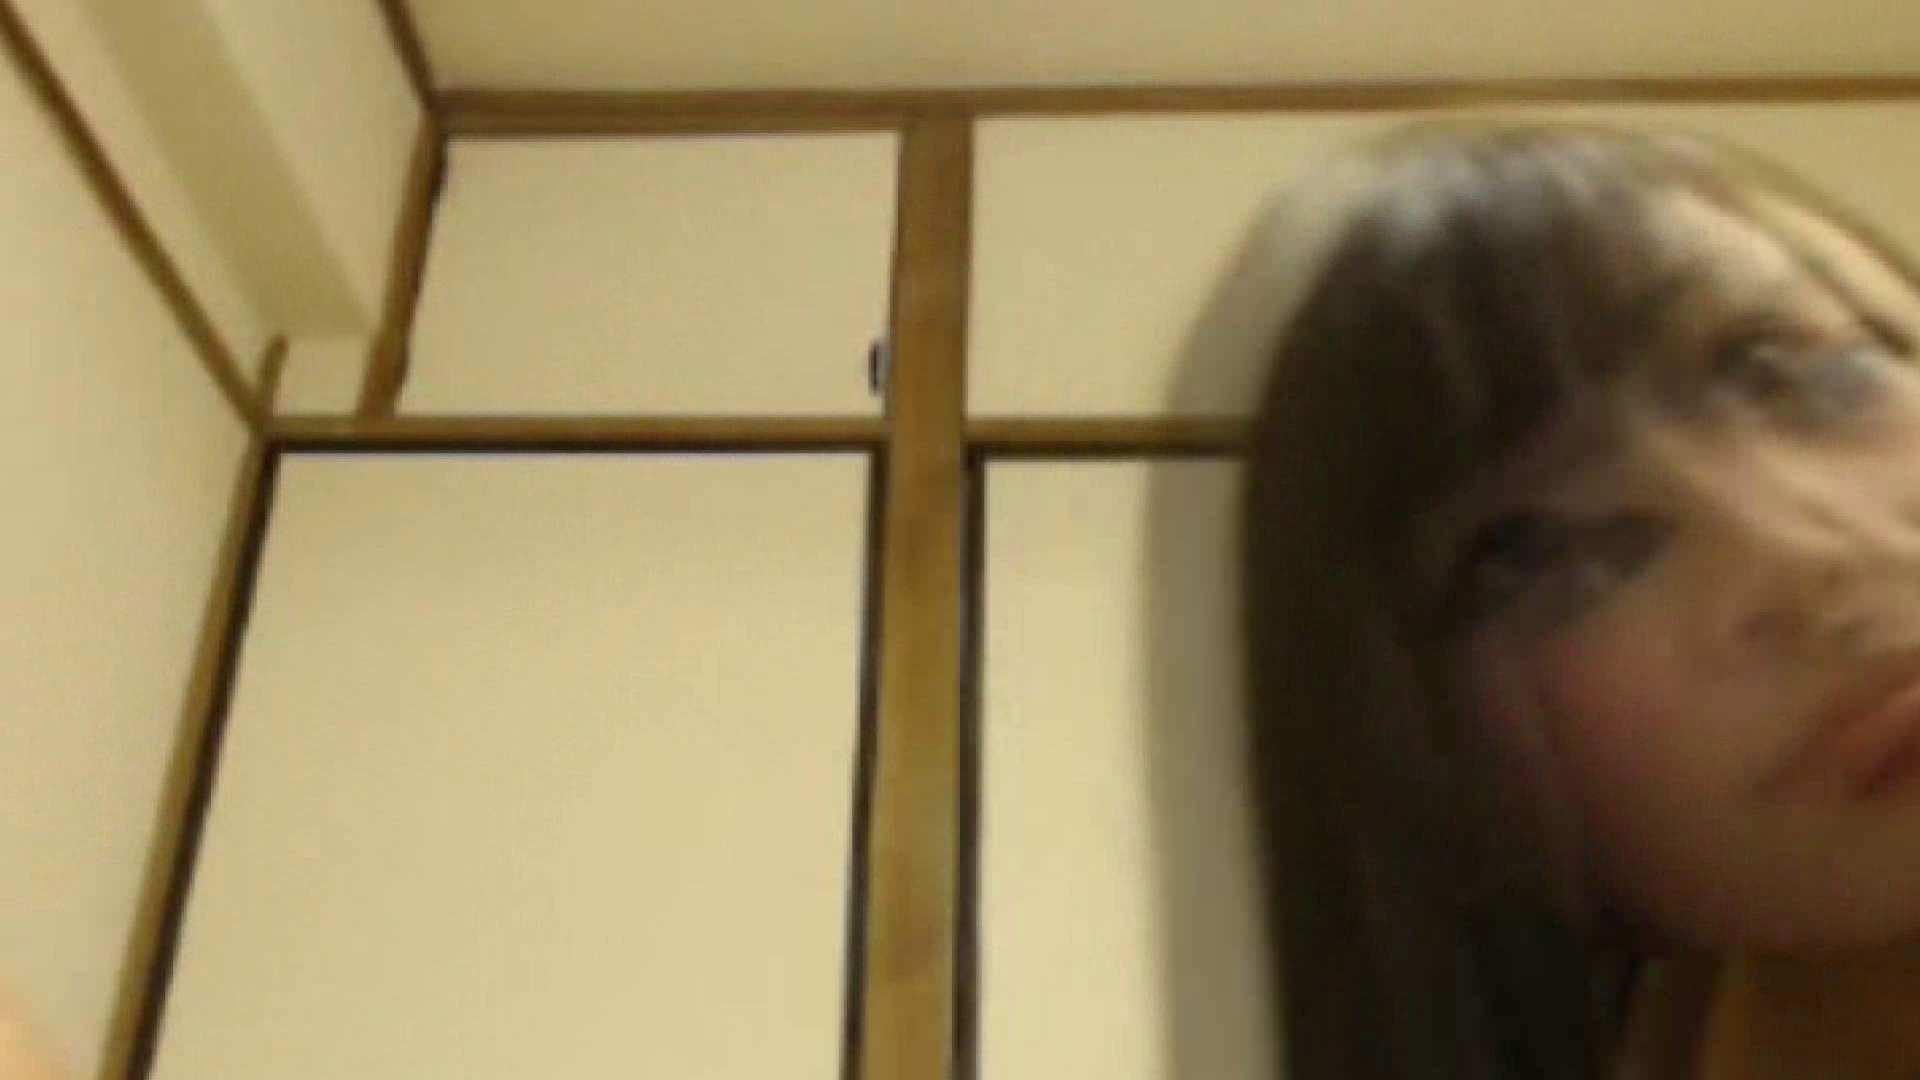 S級ギャルのハメ撮り!生チャット!Vol.21後編 美女   ギャルのエロ生活  73連発 29